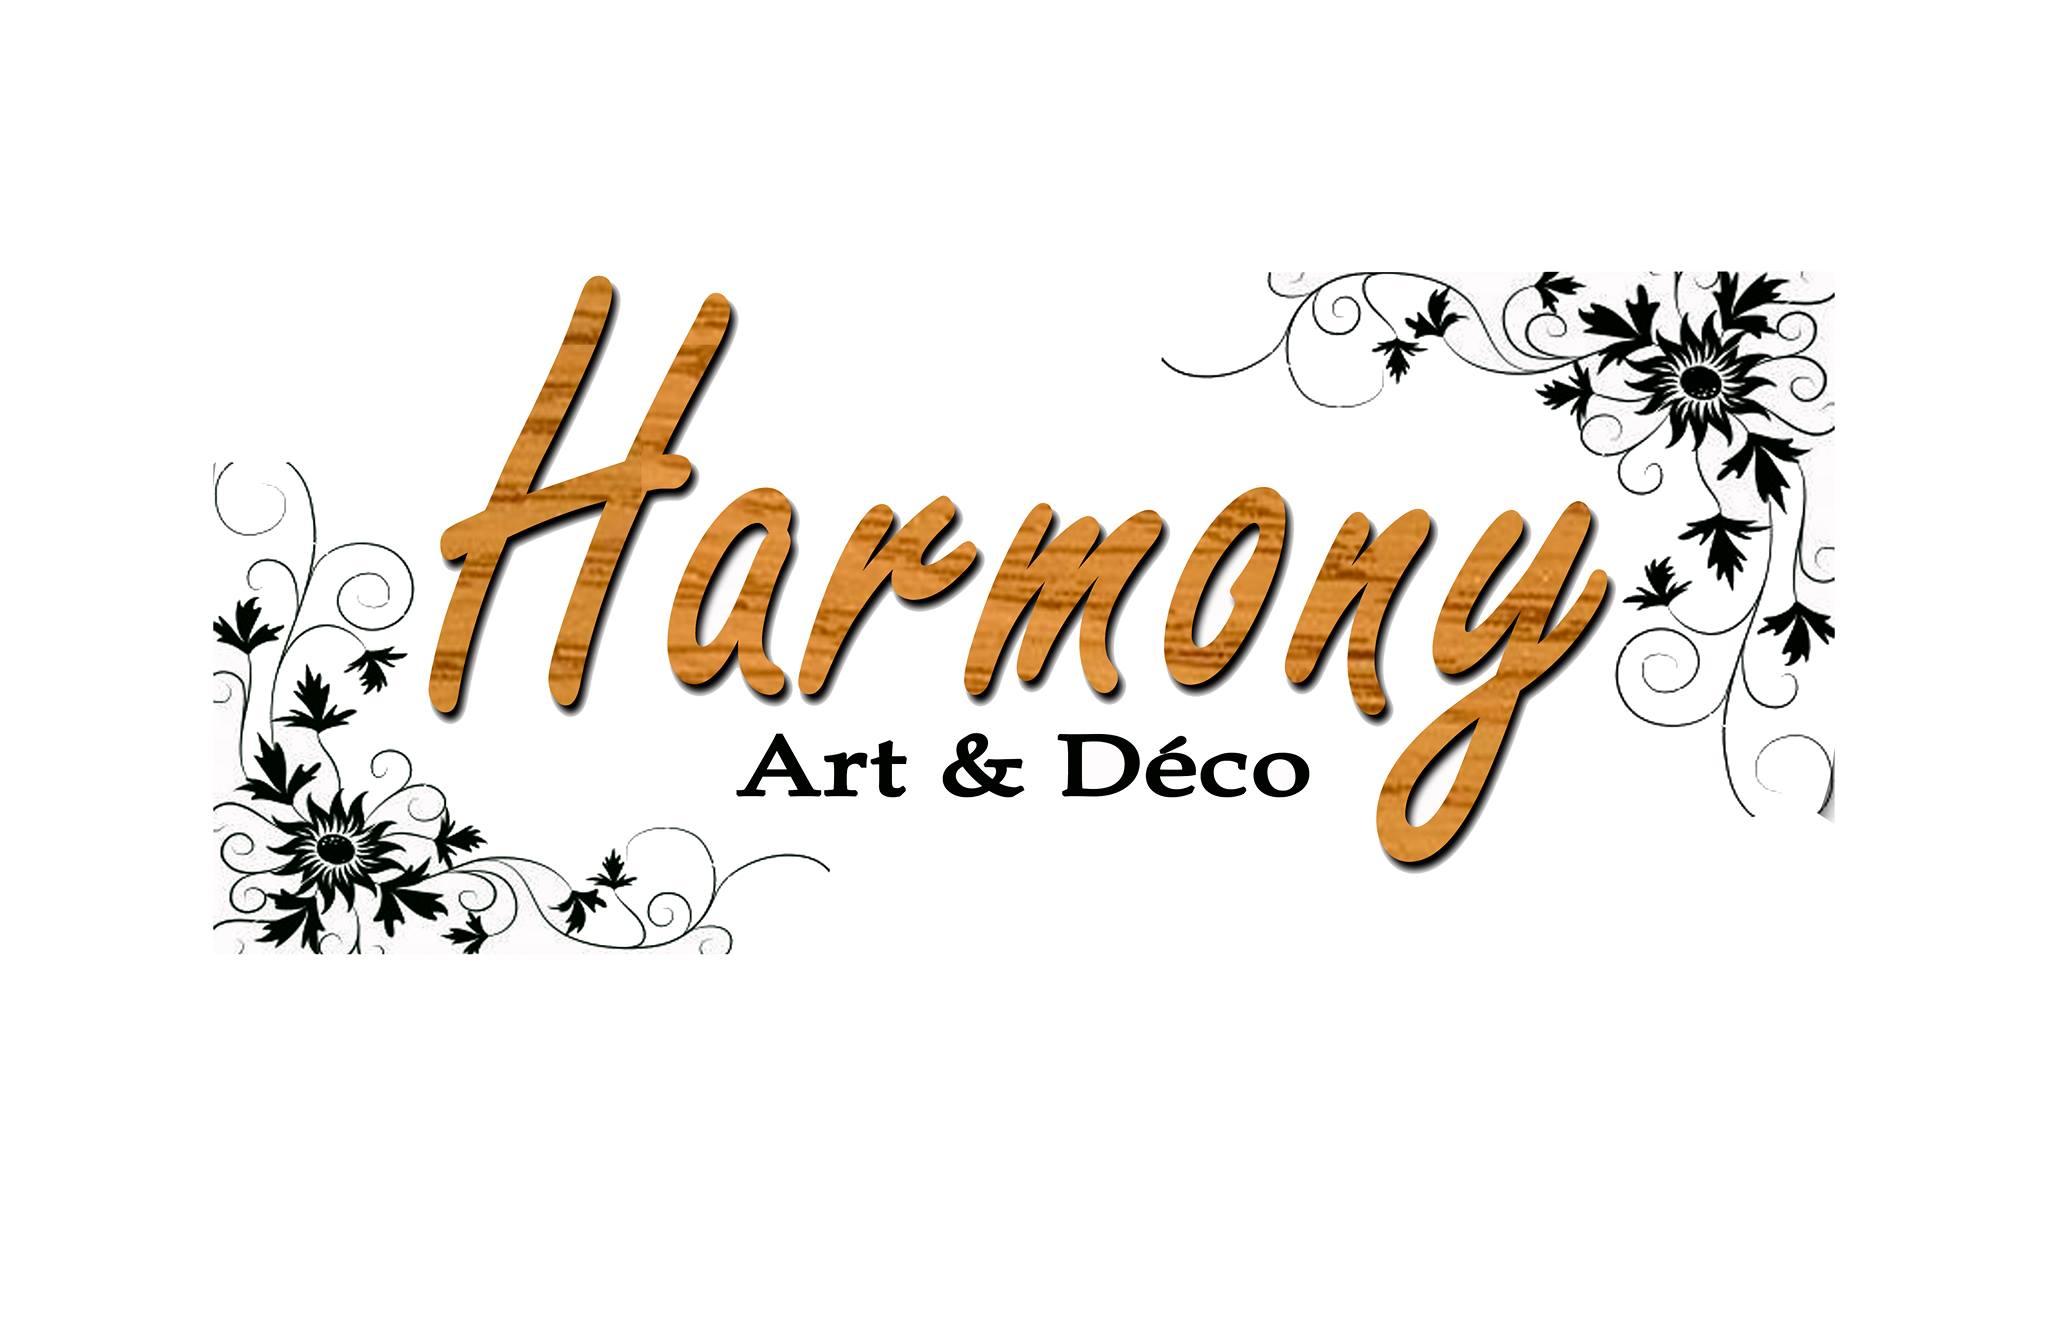 Galerie Harmony Art & Déco